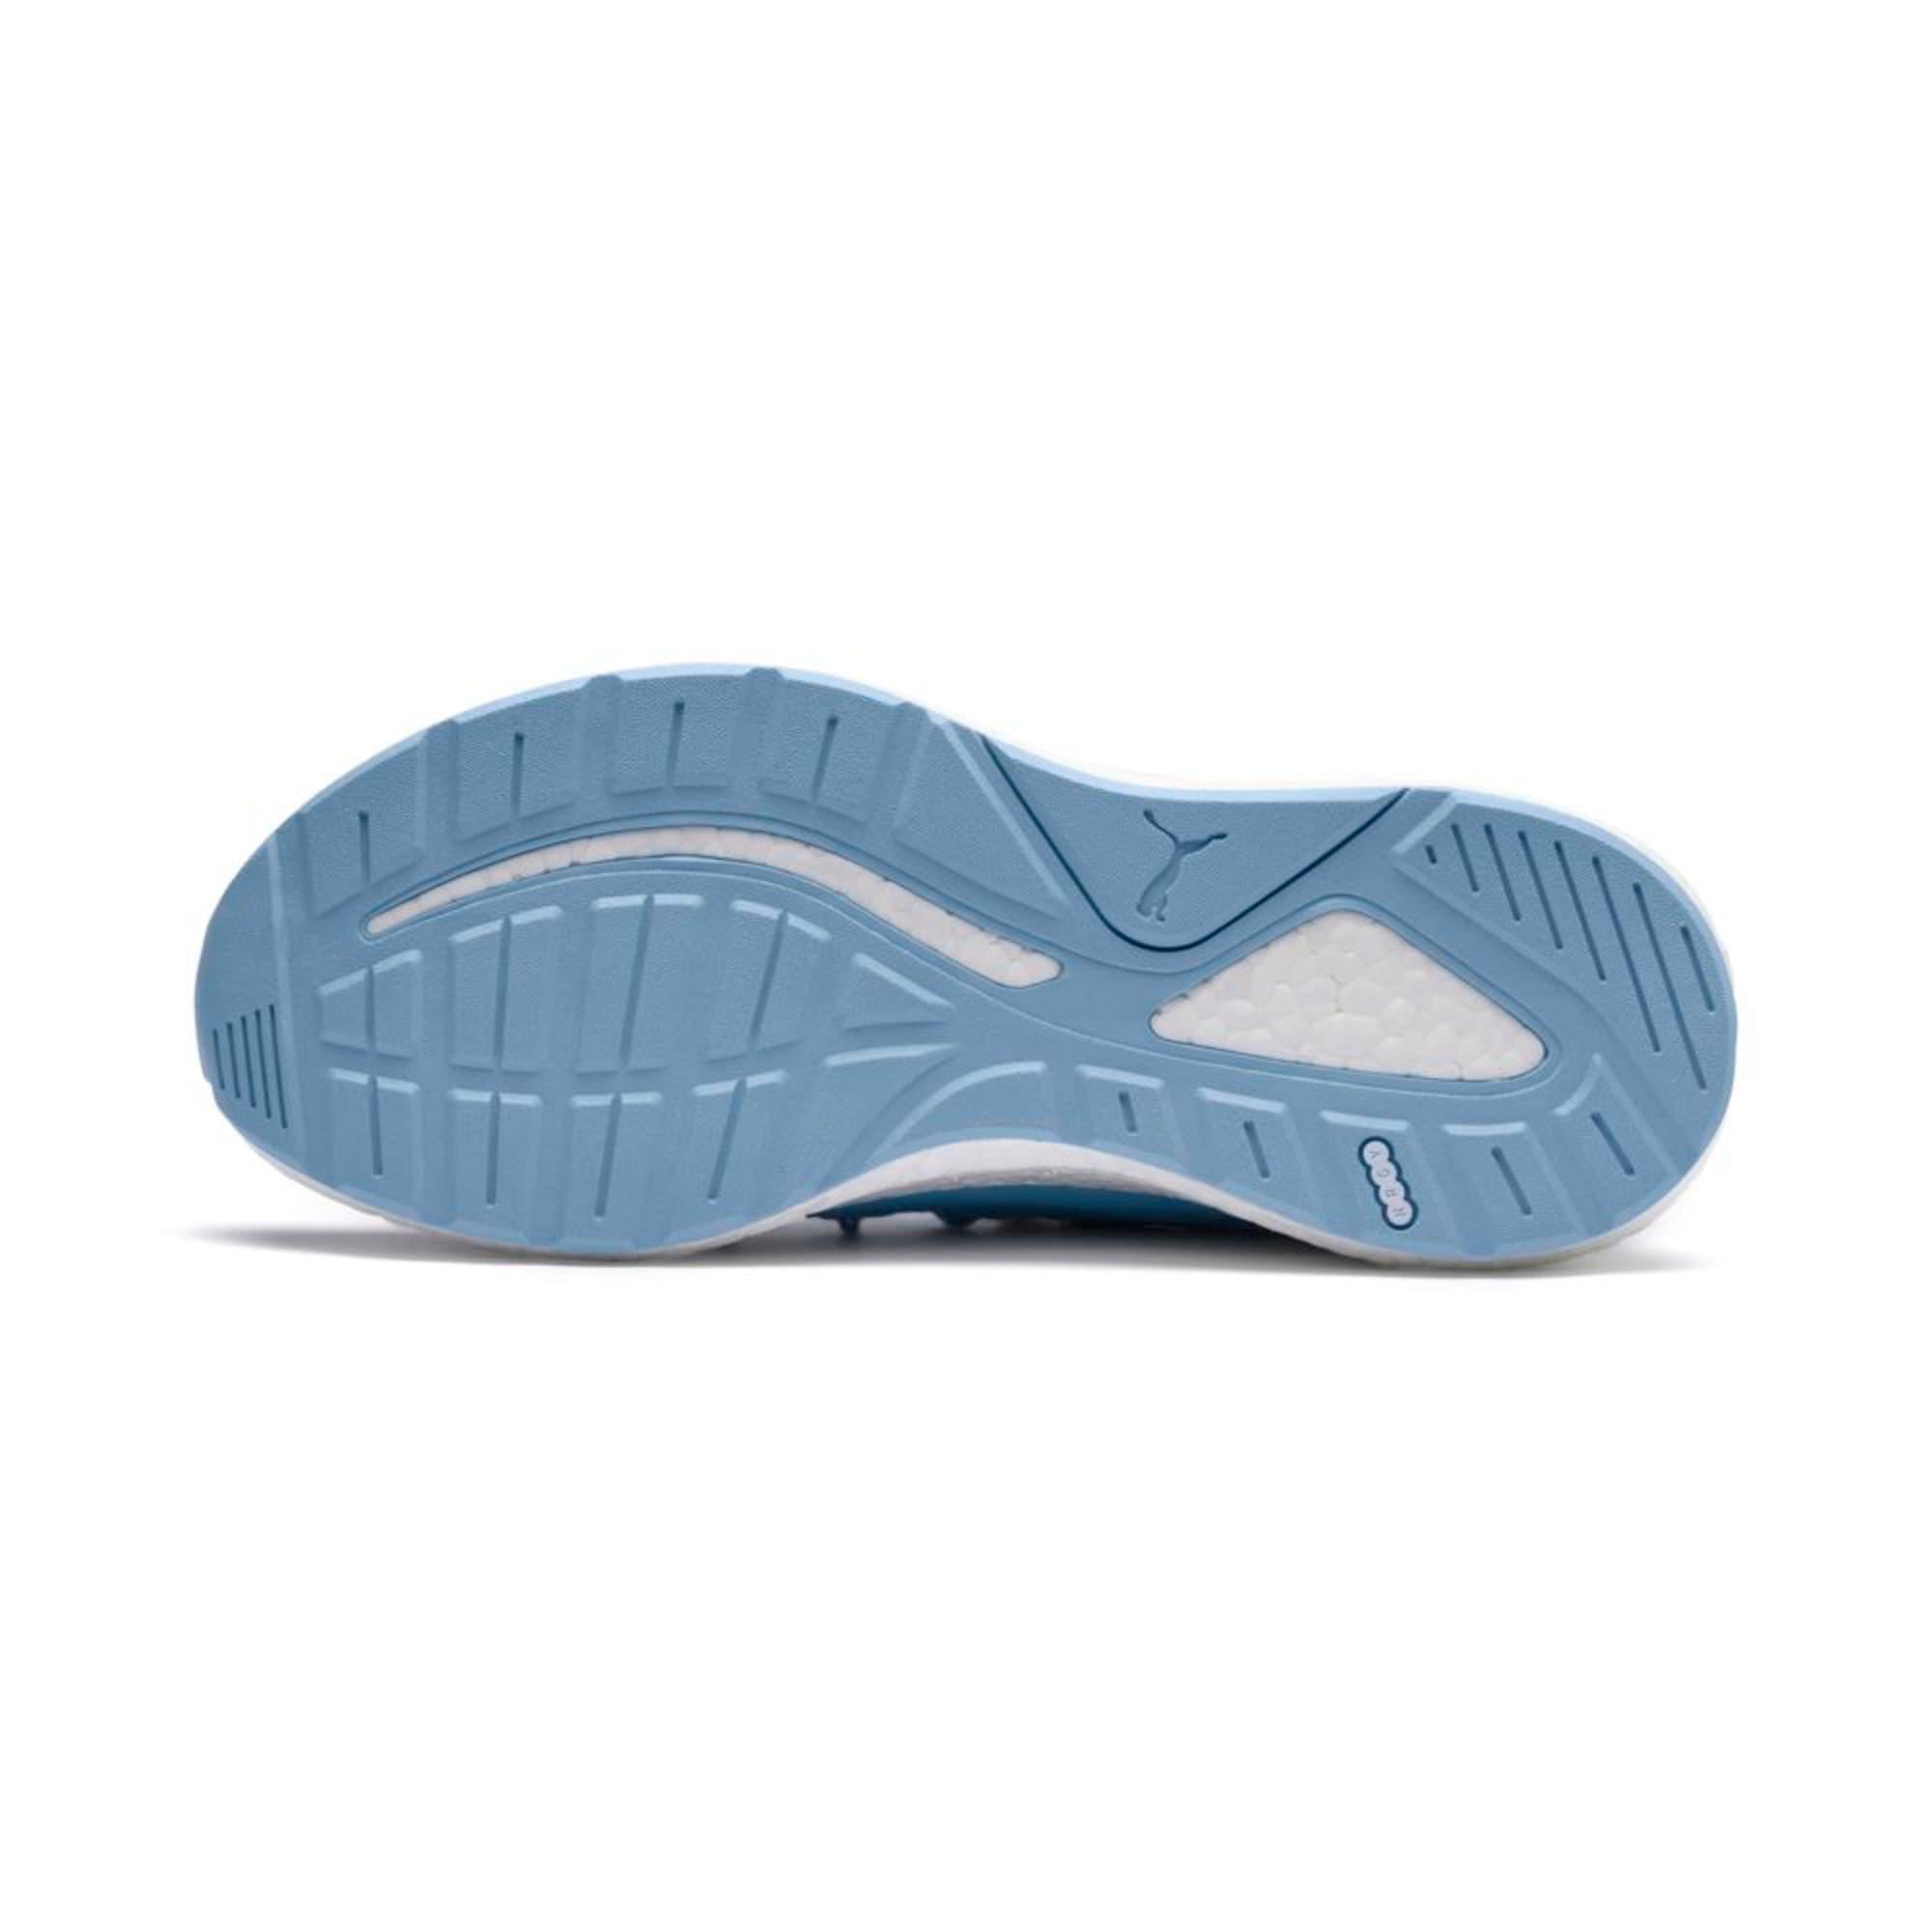 Thumbnail 2 of NRGY Neko Knit Women's Running Shoes, CERULEAN-Peacoat, medium-IND